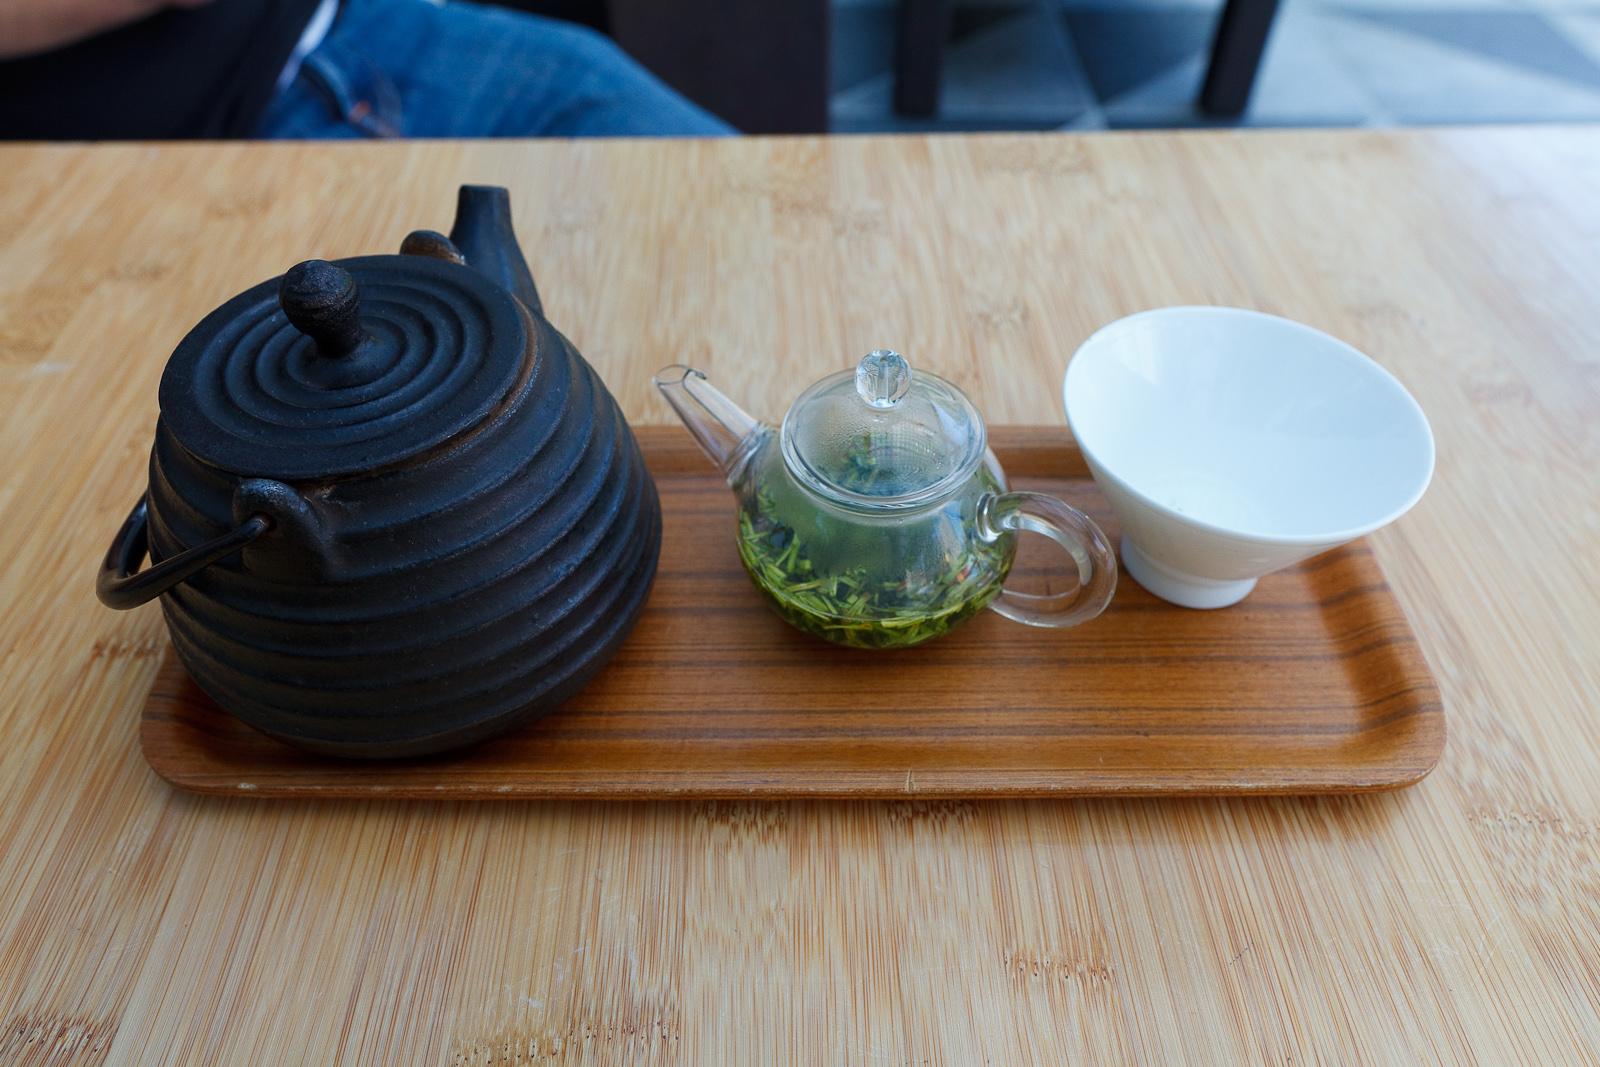 Paleolithic tea service - Green tea